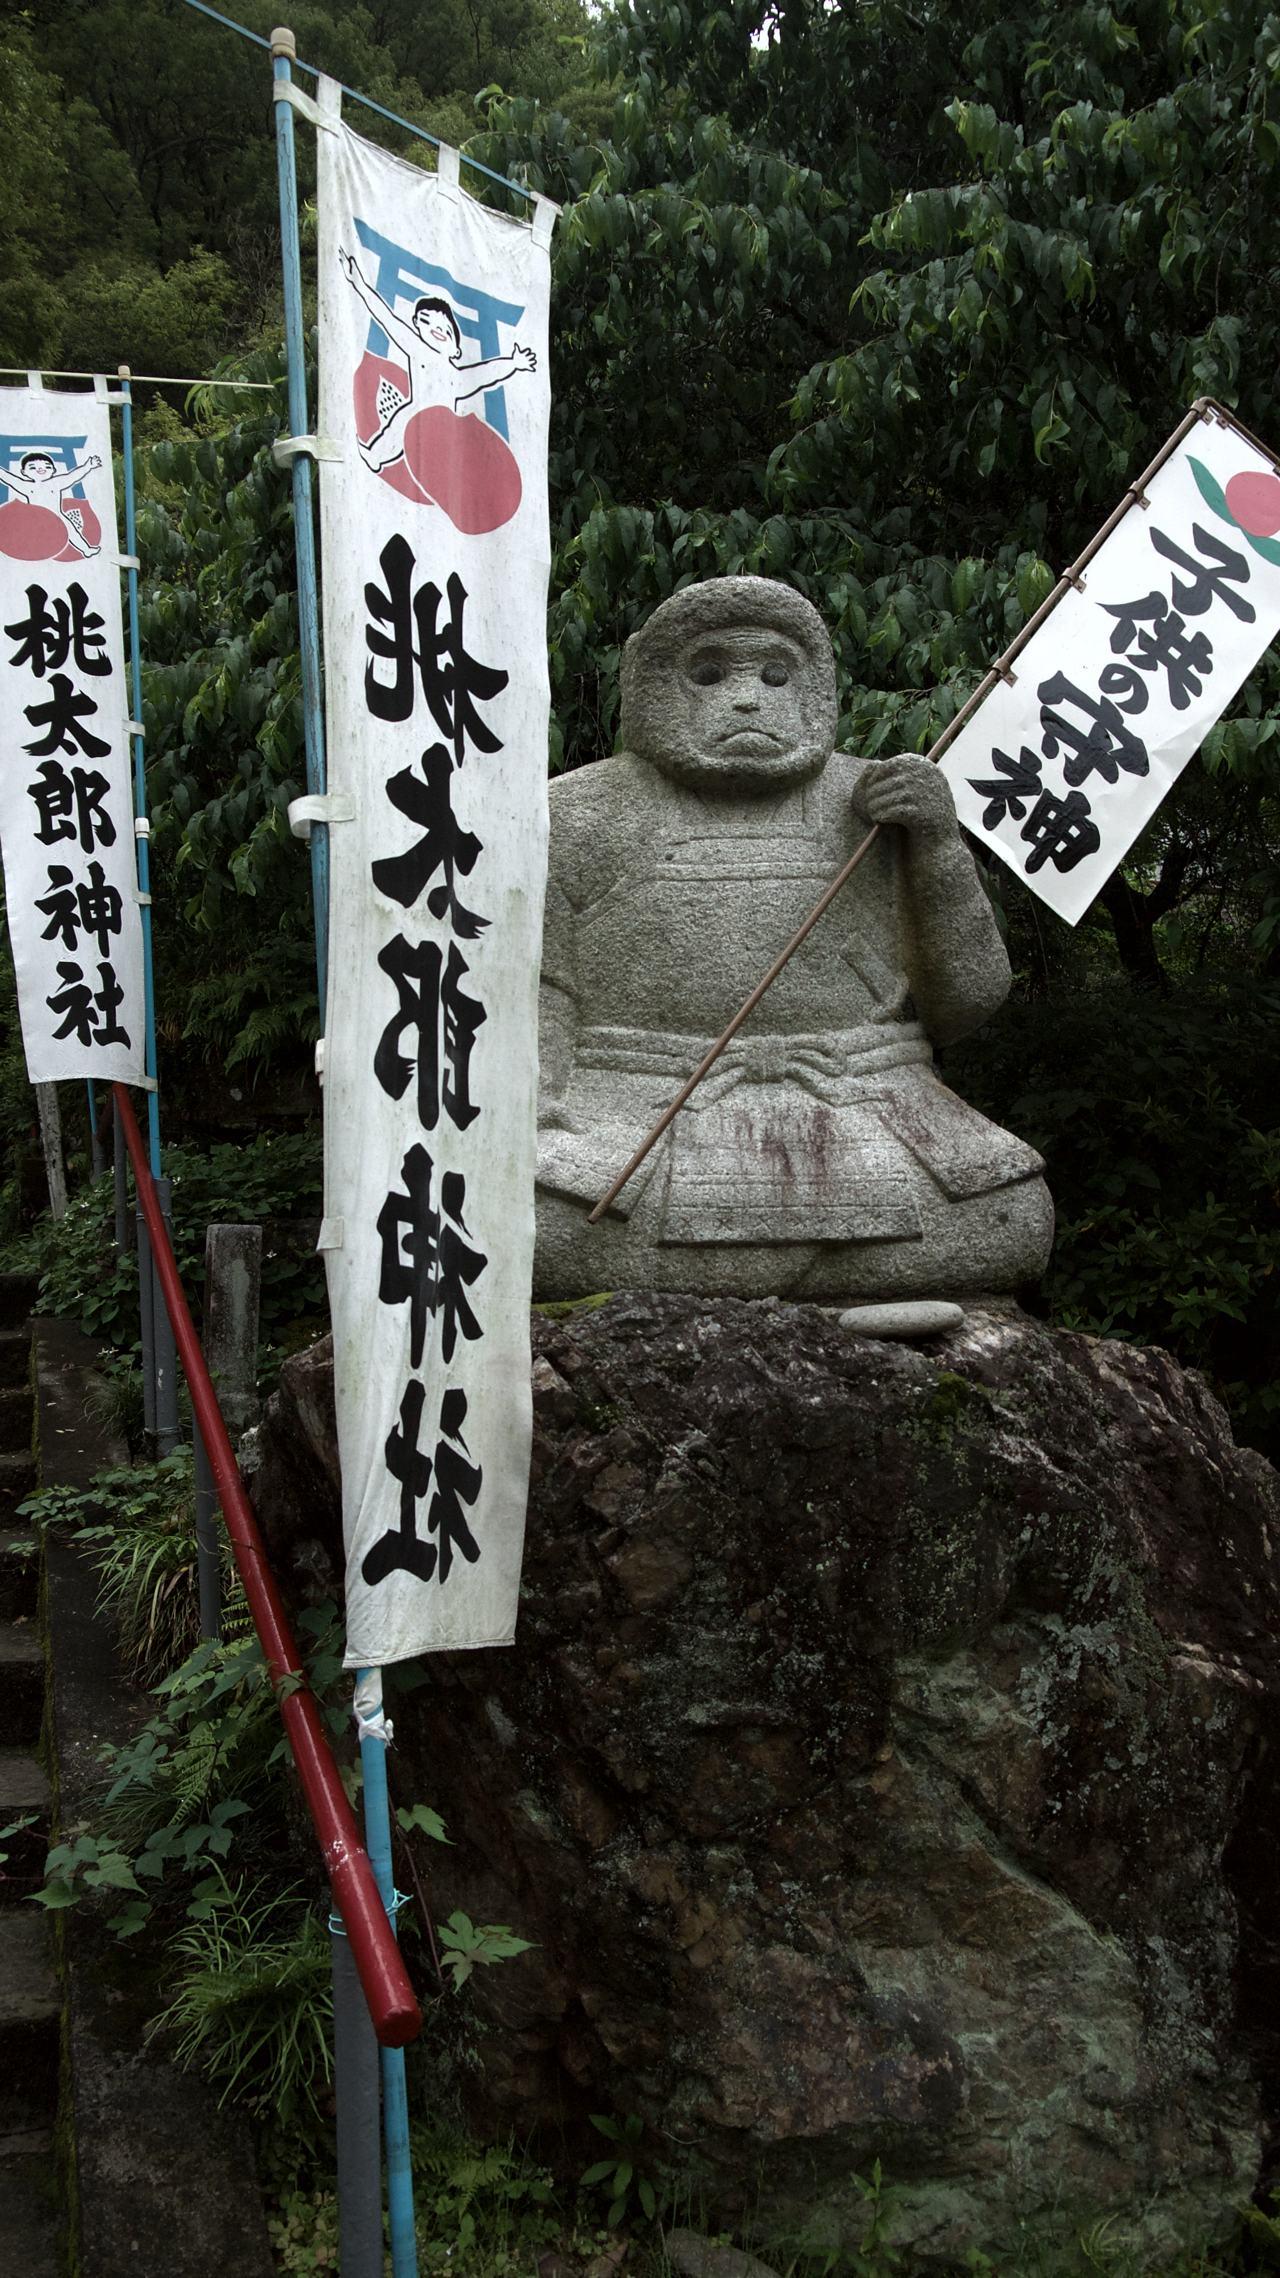 monkey god who protects children